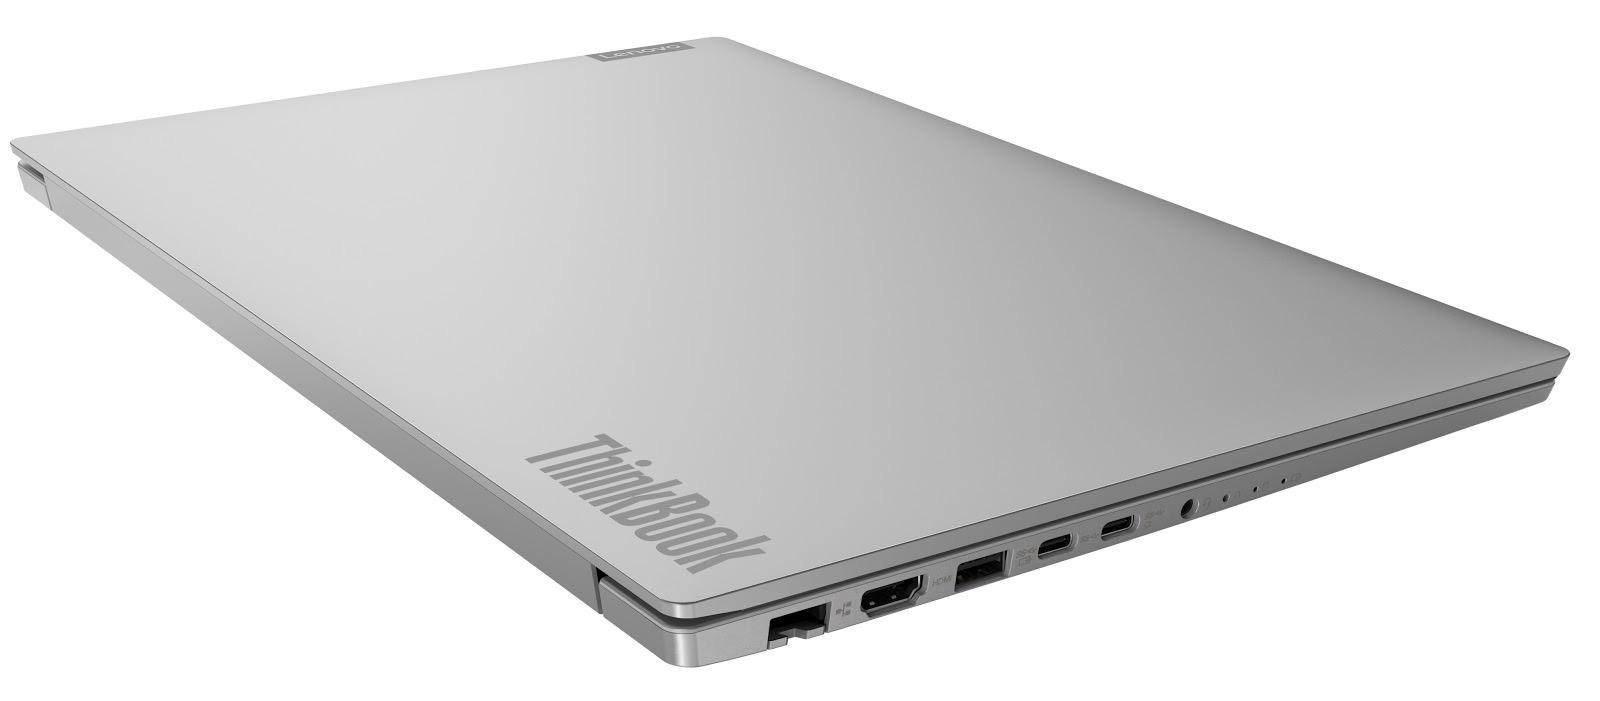 Фото 3. Ноутбук Lenovo ThinkBook 15-IIL (20SM007RRU)